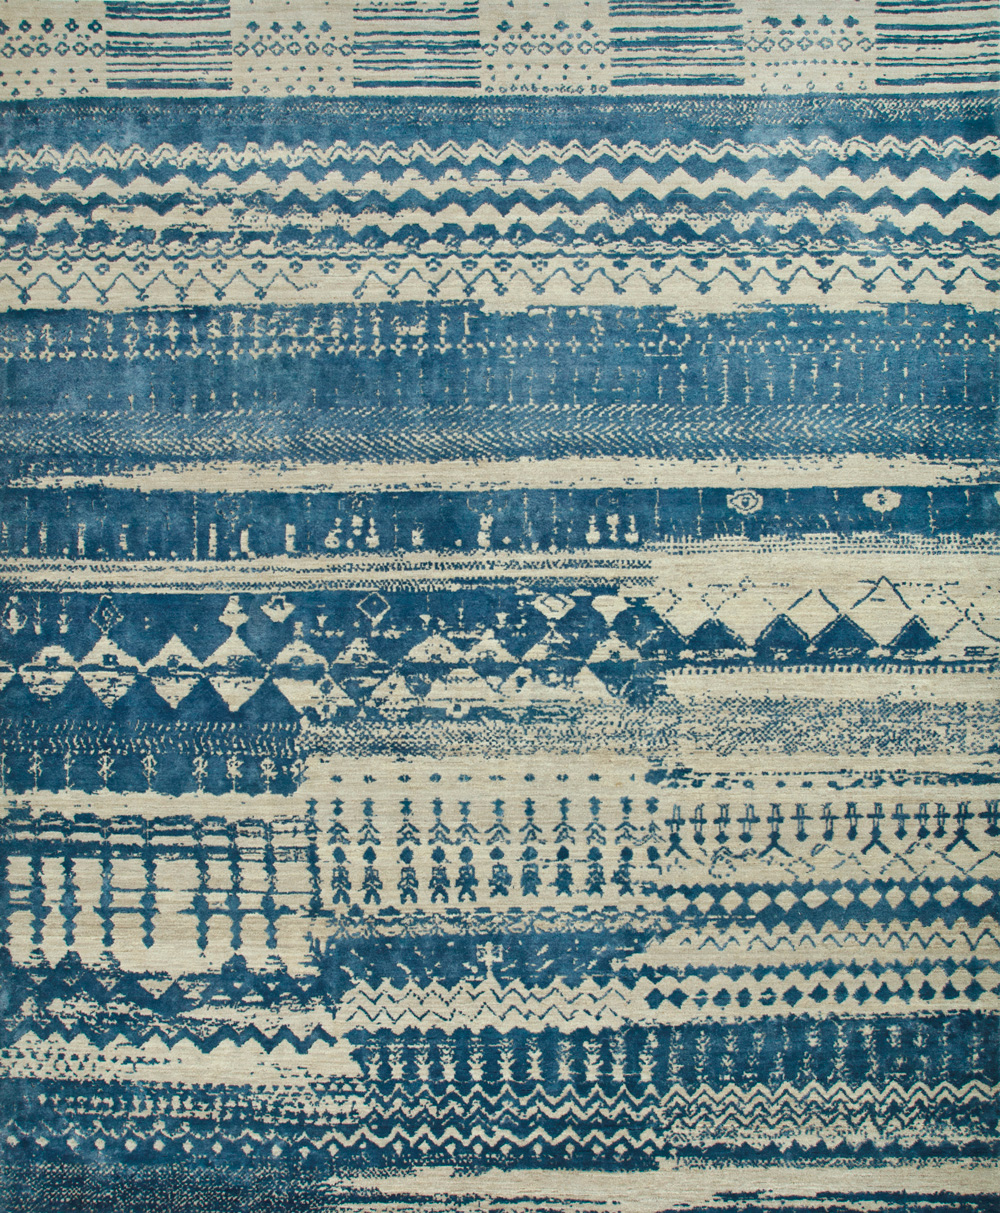 Jaipur Rugs, Antar, Project Error